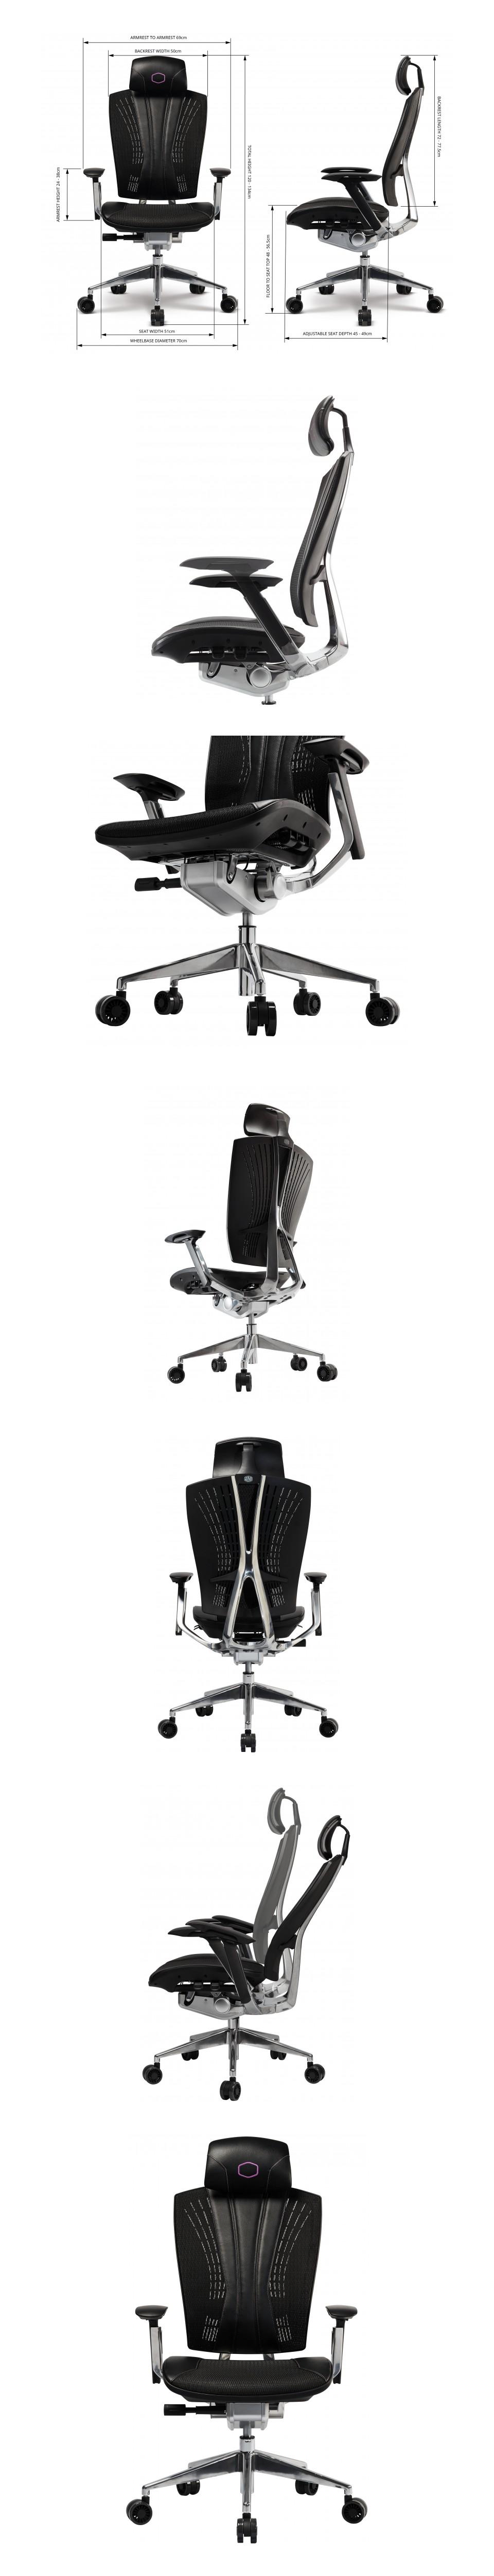 Cooler Master Ergo L Ergonomic Ultra Large Adjustable Chair product